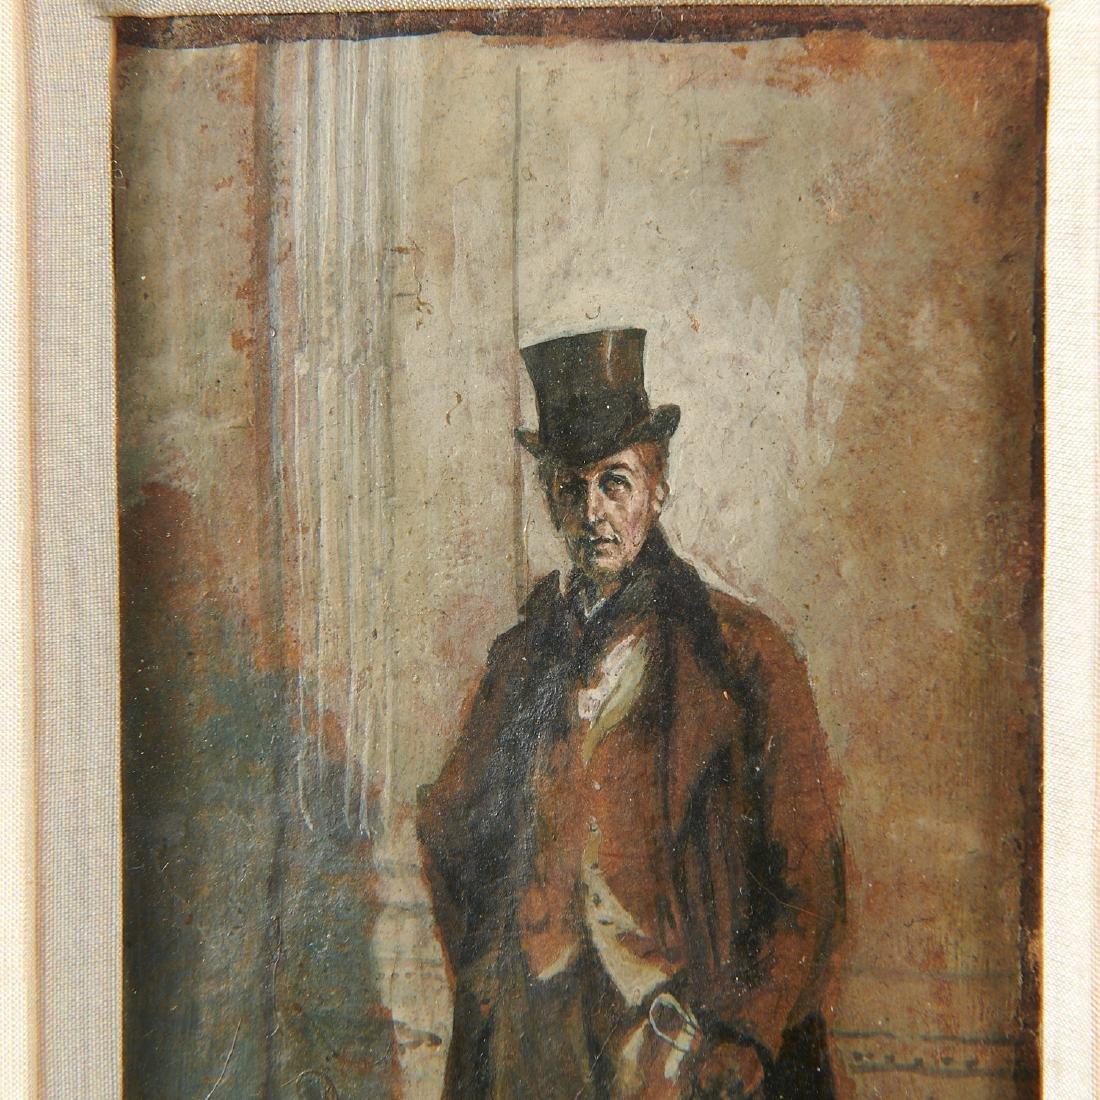 John Singer Sargent (attrib.), Lord Ribblesdale - 3